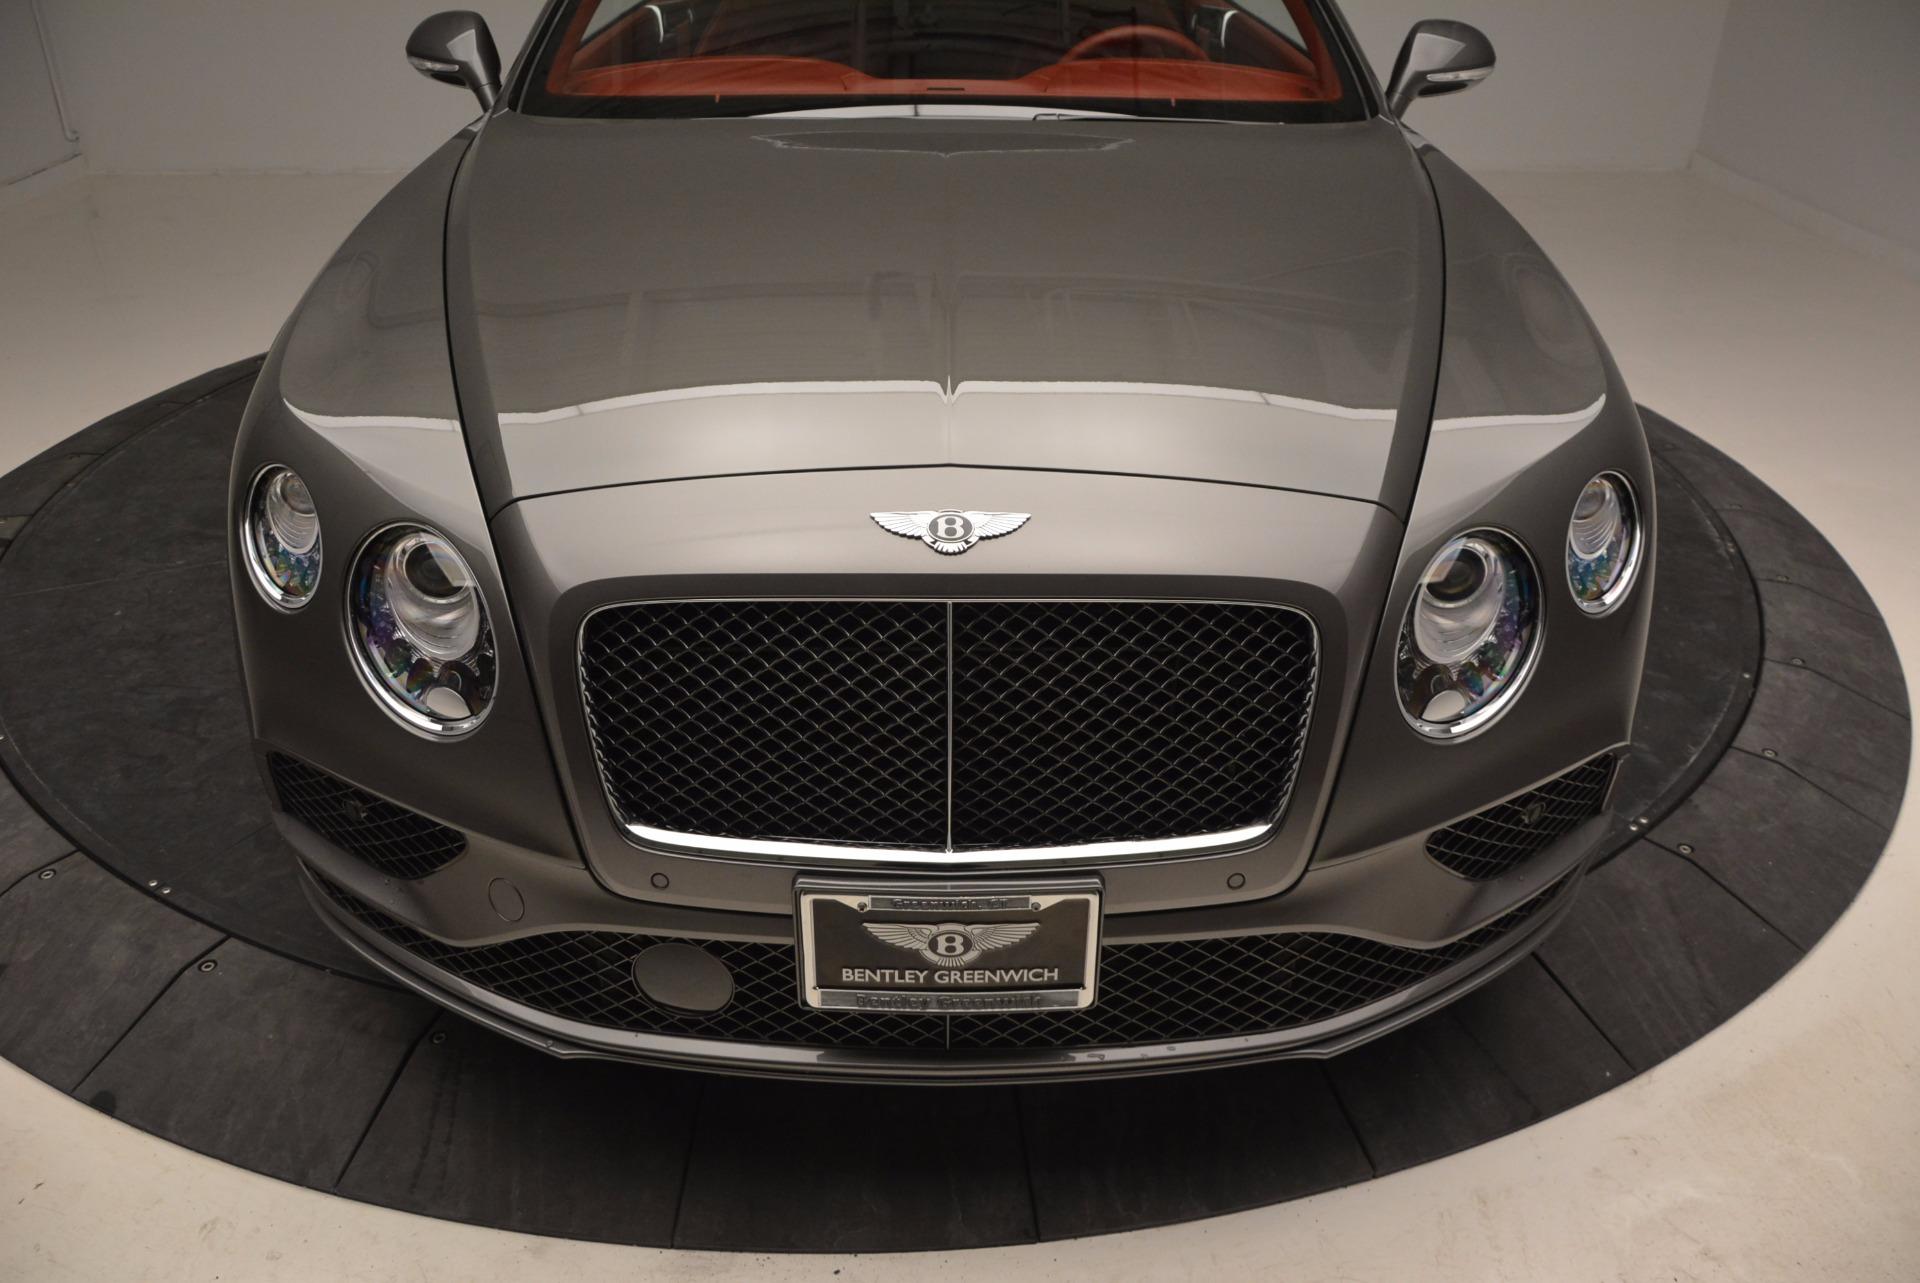 Used 2016 Bentley Continental GT Speed For Sale In Westport, CT 910_p13